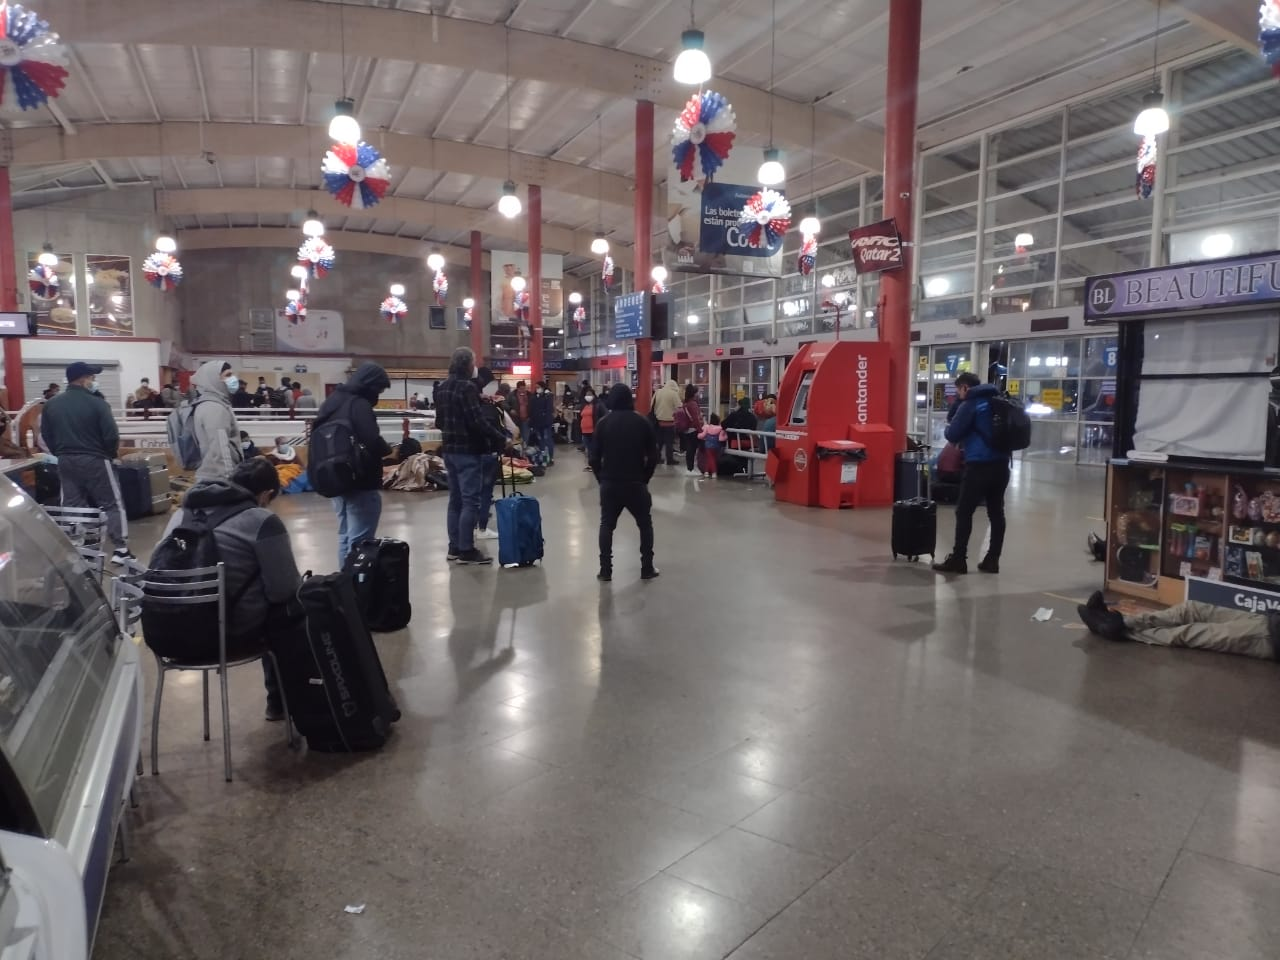 Terminal de buses de Antofagasta | Foto: Daniel Rojas Díaz